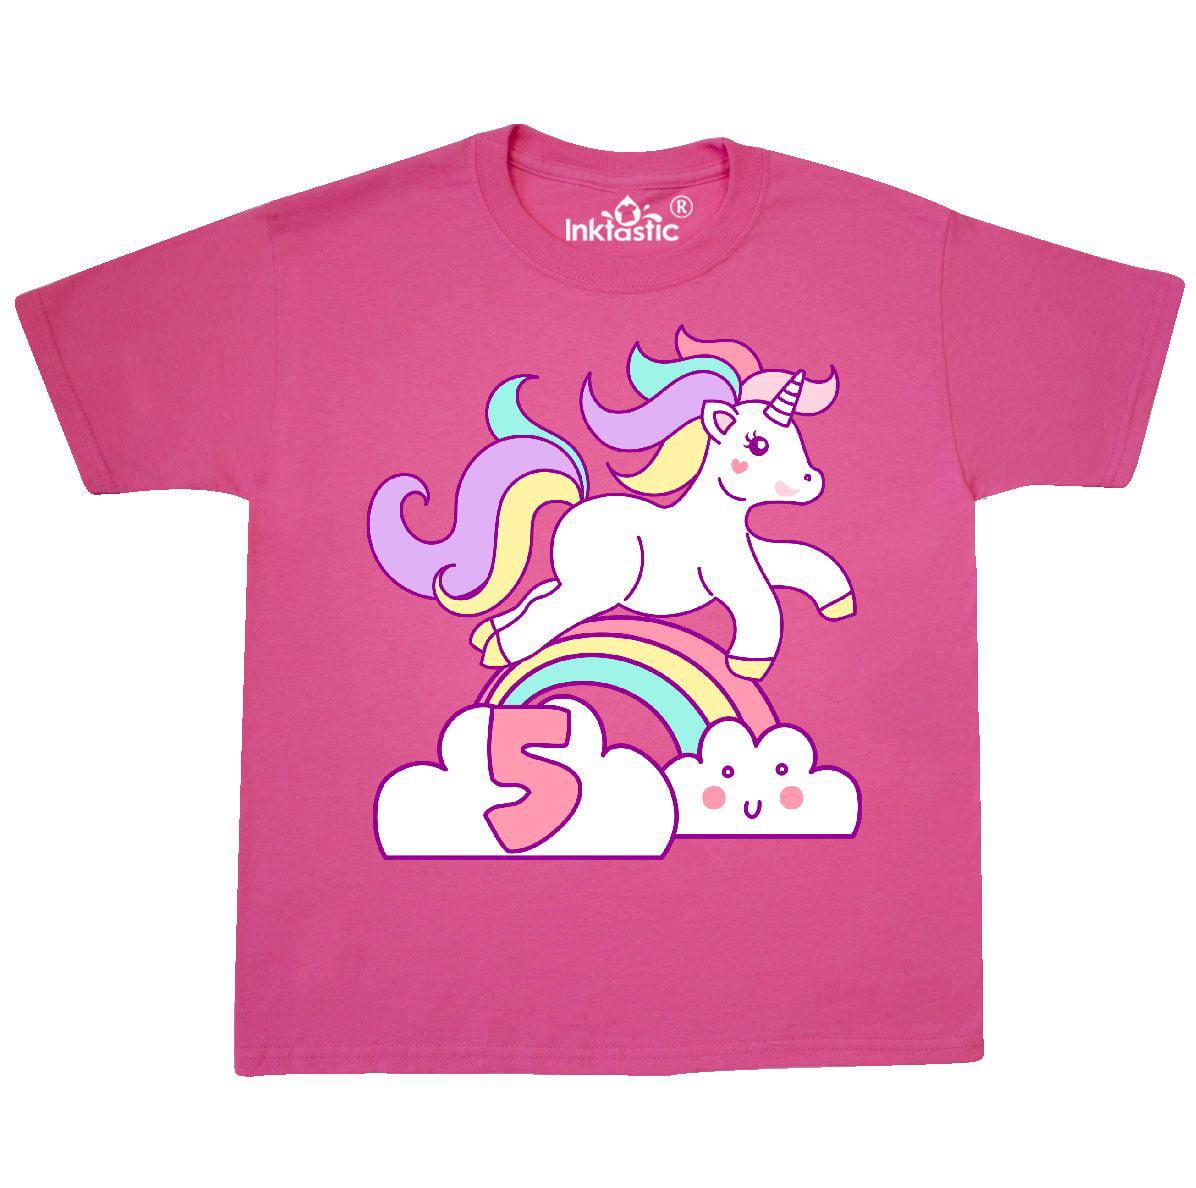 18559d29390 Inktastic unicorn birthday youth shirt bday cute tee kids children child  jpg 1196x1188 Ebay tops blue